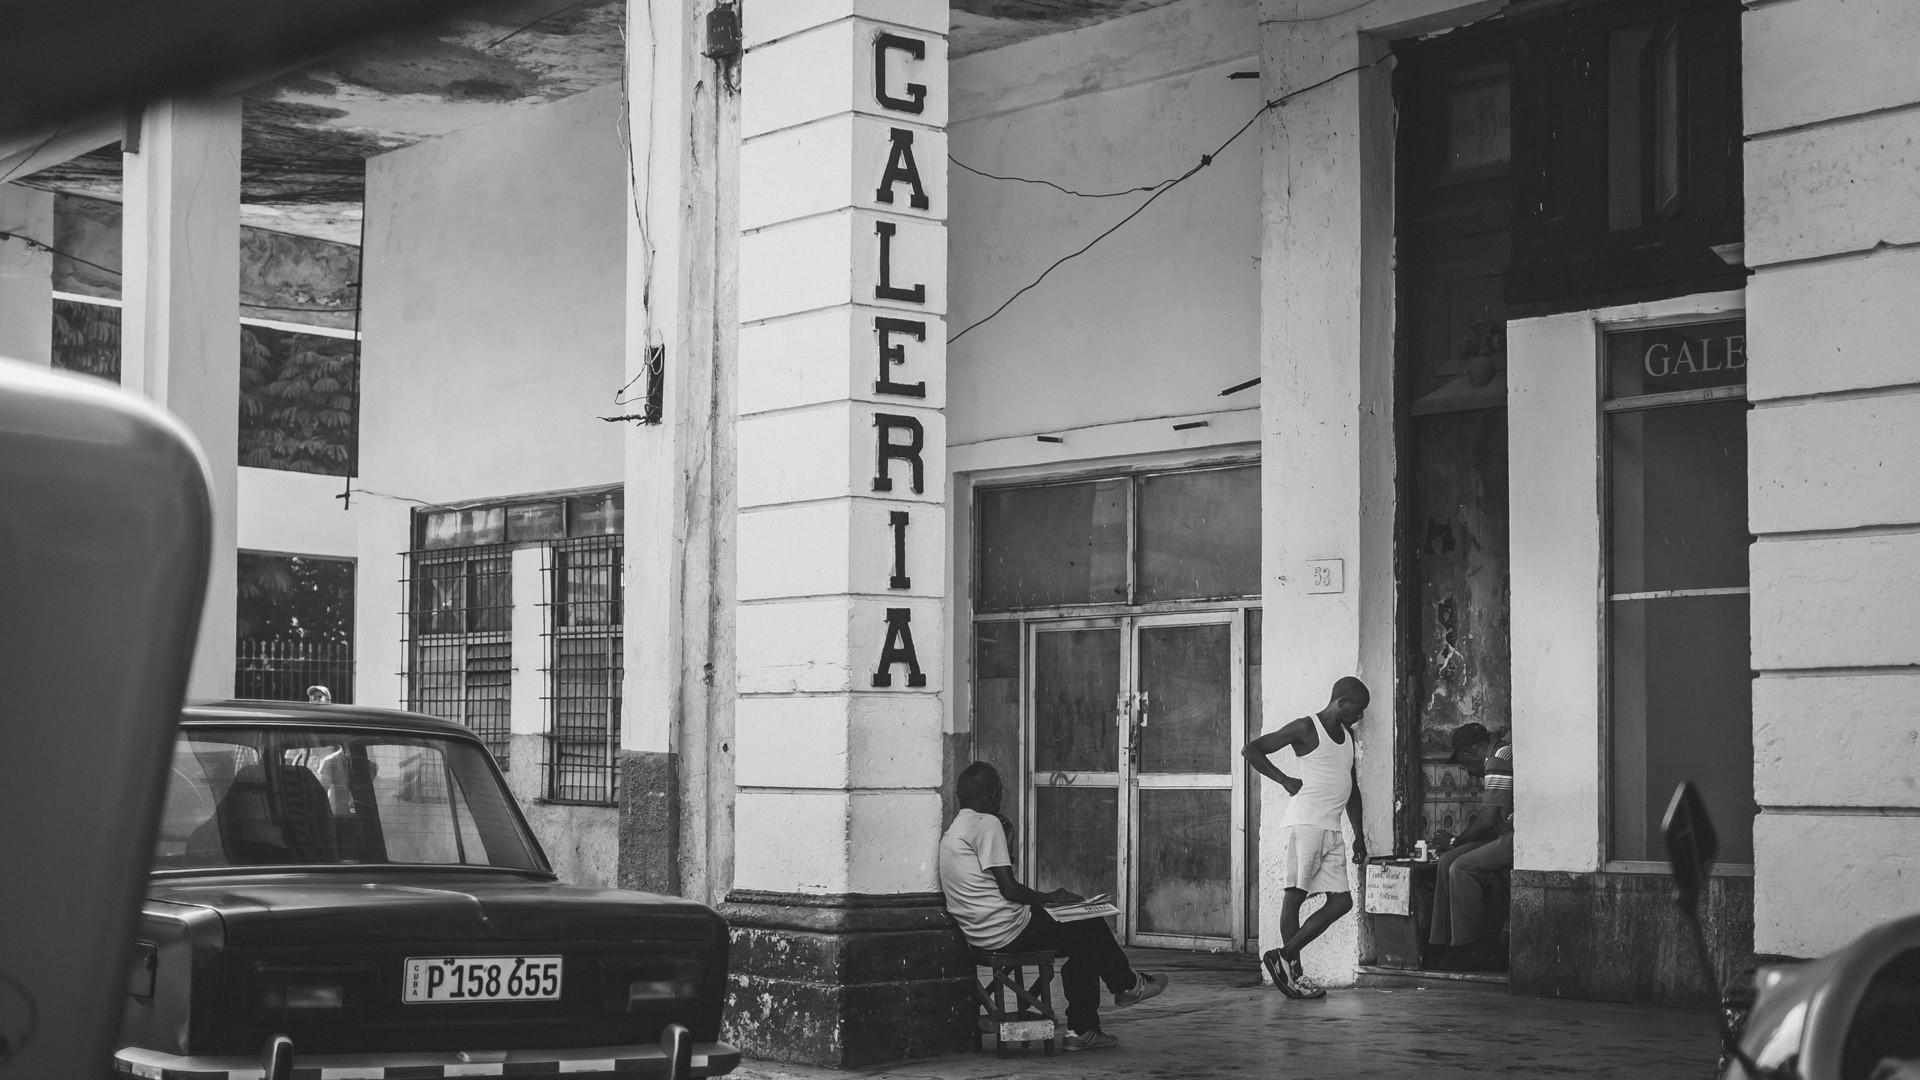 Damien-Dohmen-Photographe-Cuba-22